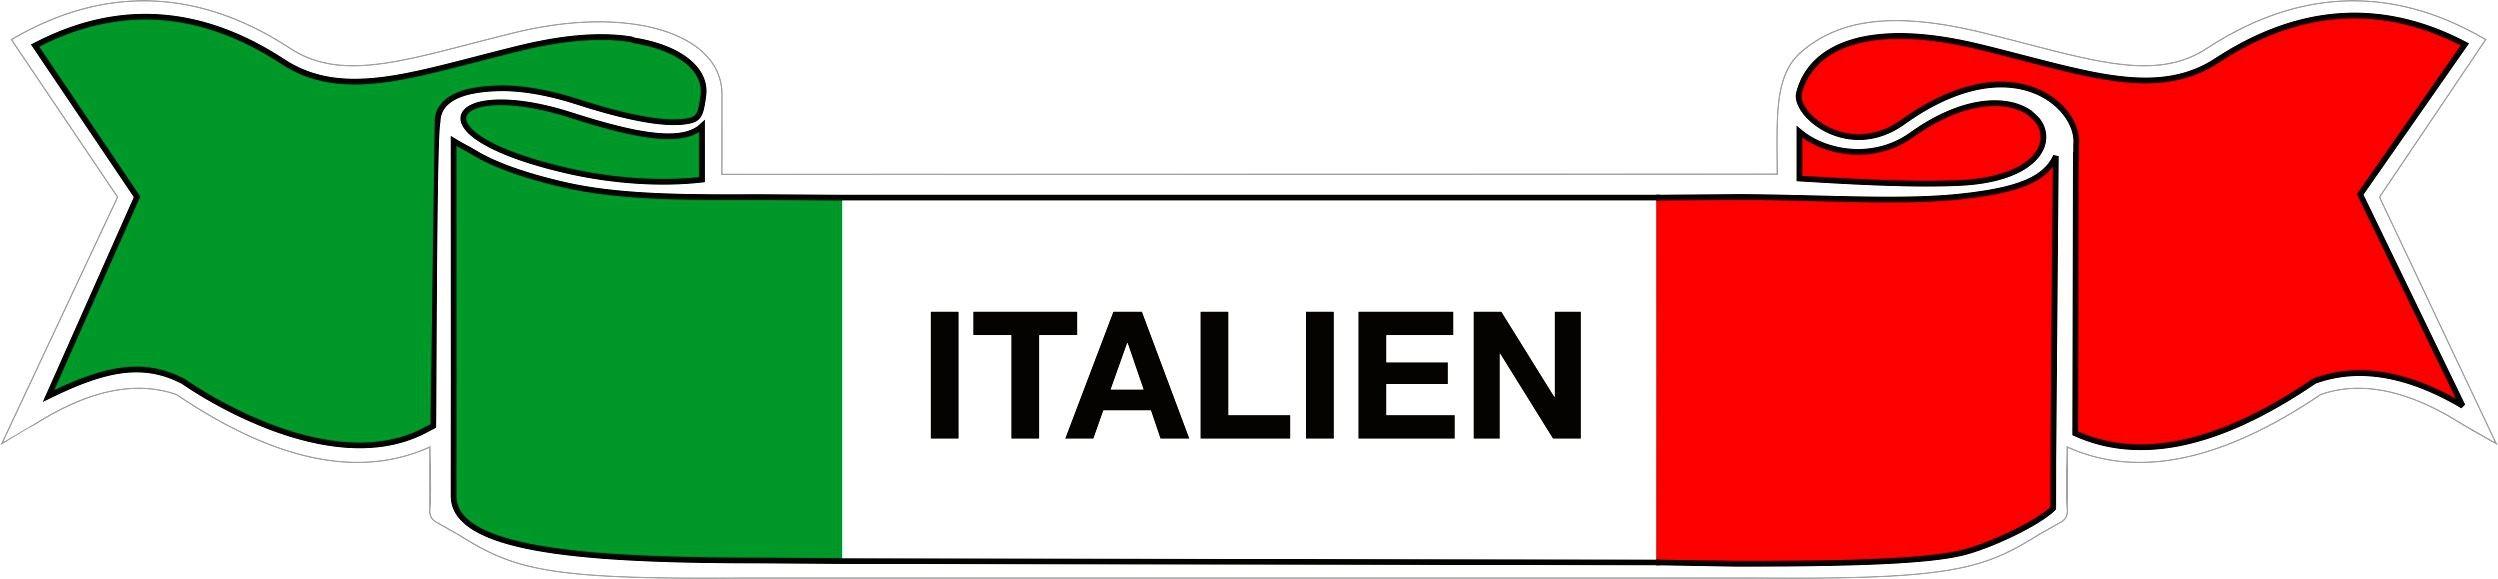 Aufkleber Flagge Italien 100 x 430 mm Deutschland Fanartikel Olympia – Bild 1